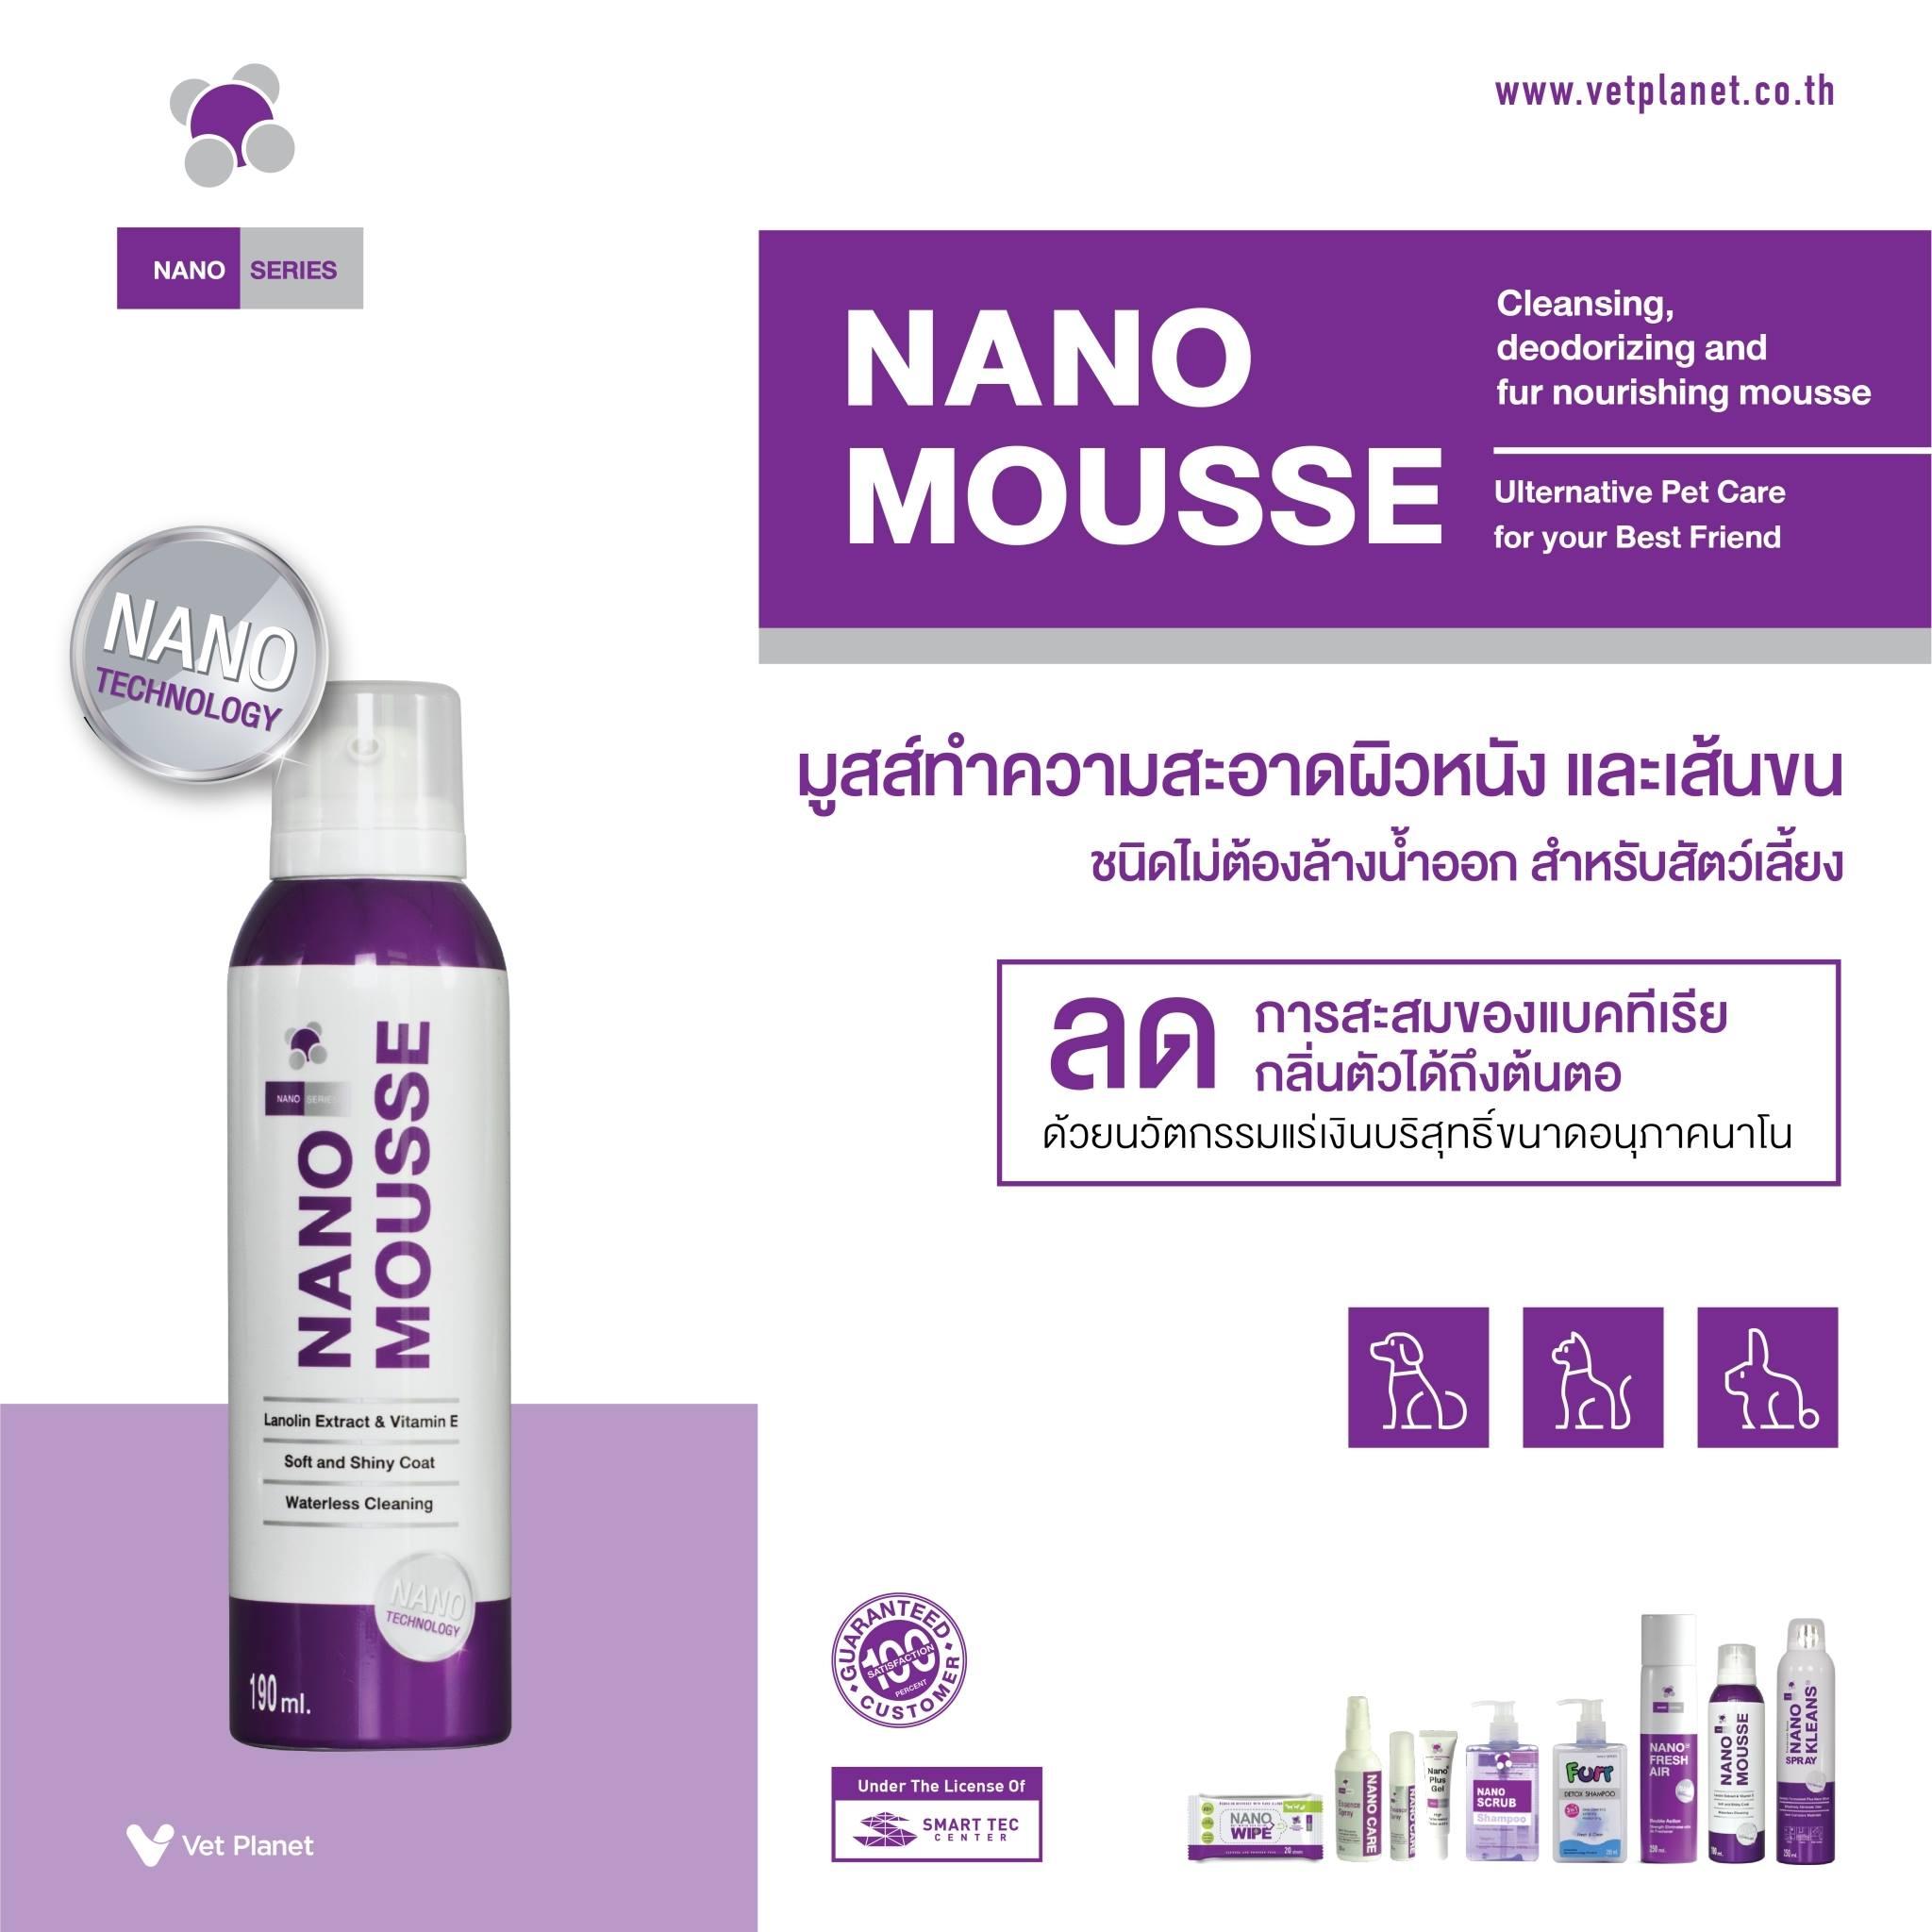 Nano Mousse นาโนมูส โฟมอาบน้ำแห้ง